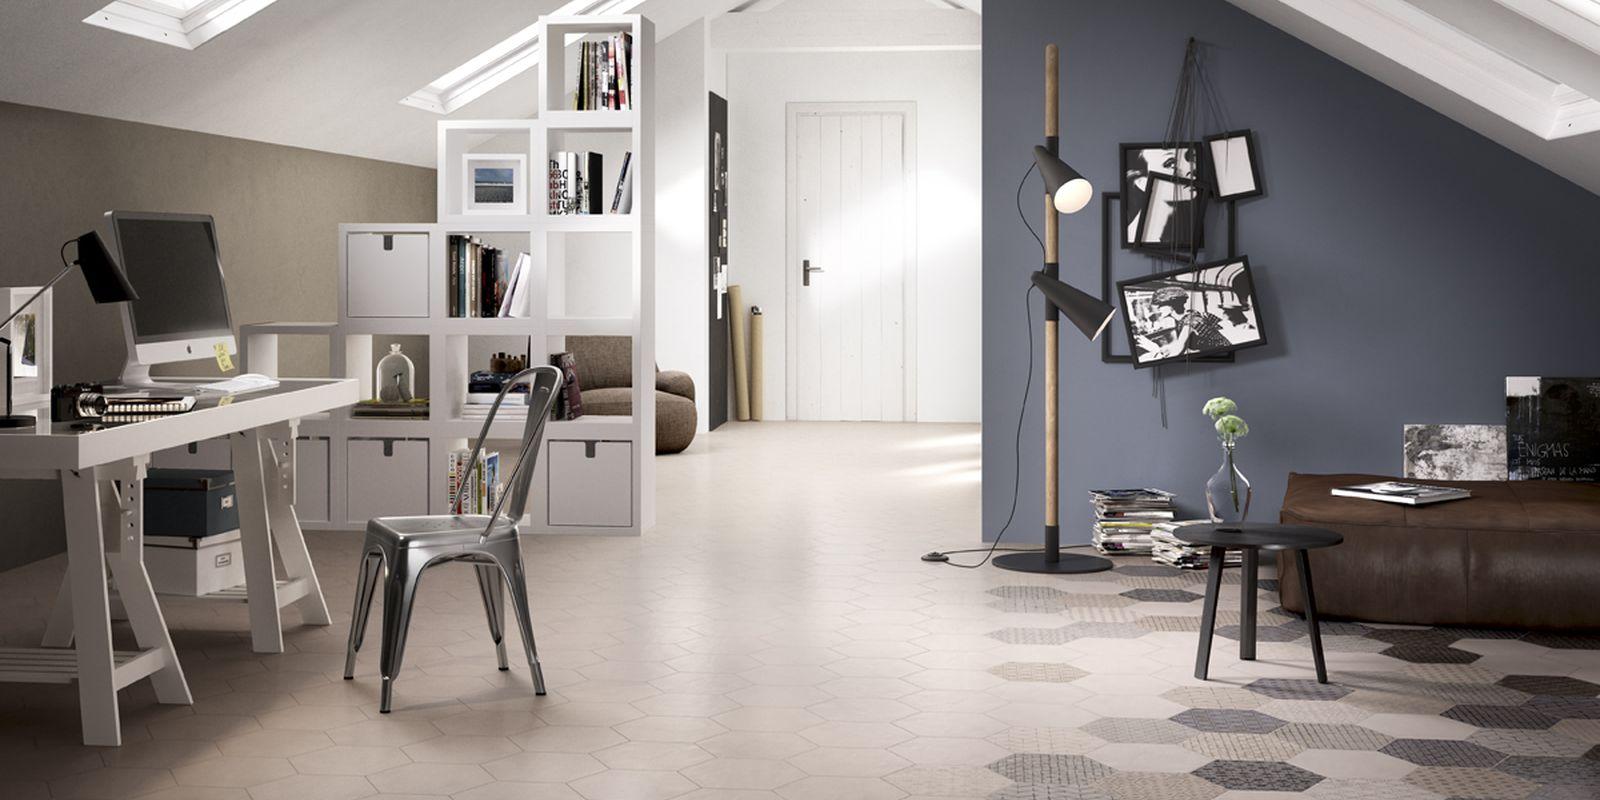 Mattonelle design piastrelle per cucina interior design for Mattonelle finte per cucina